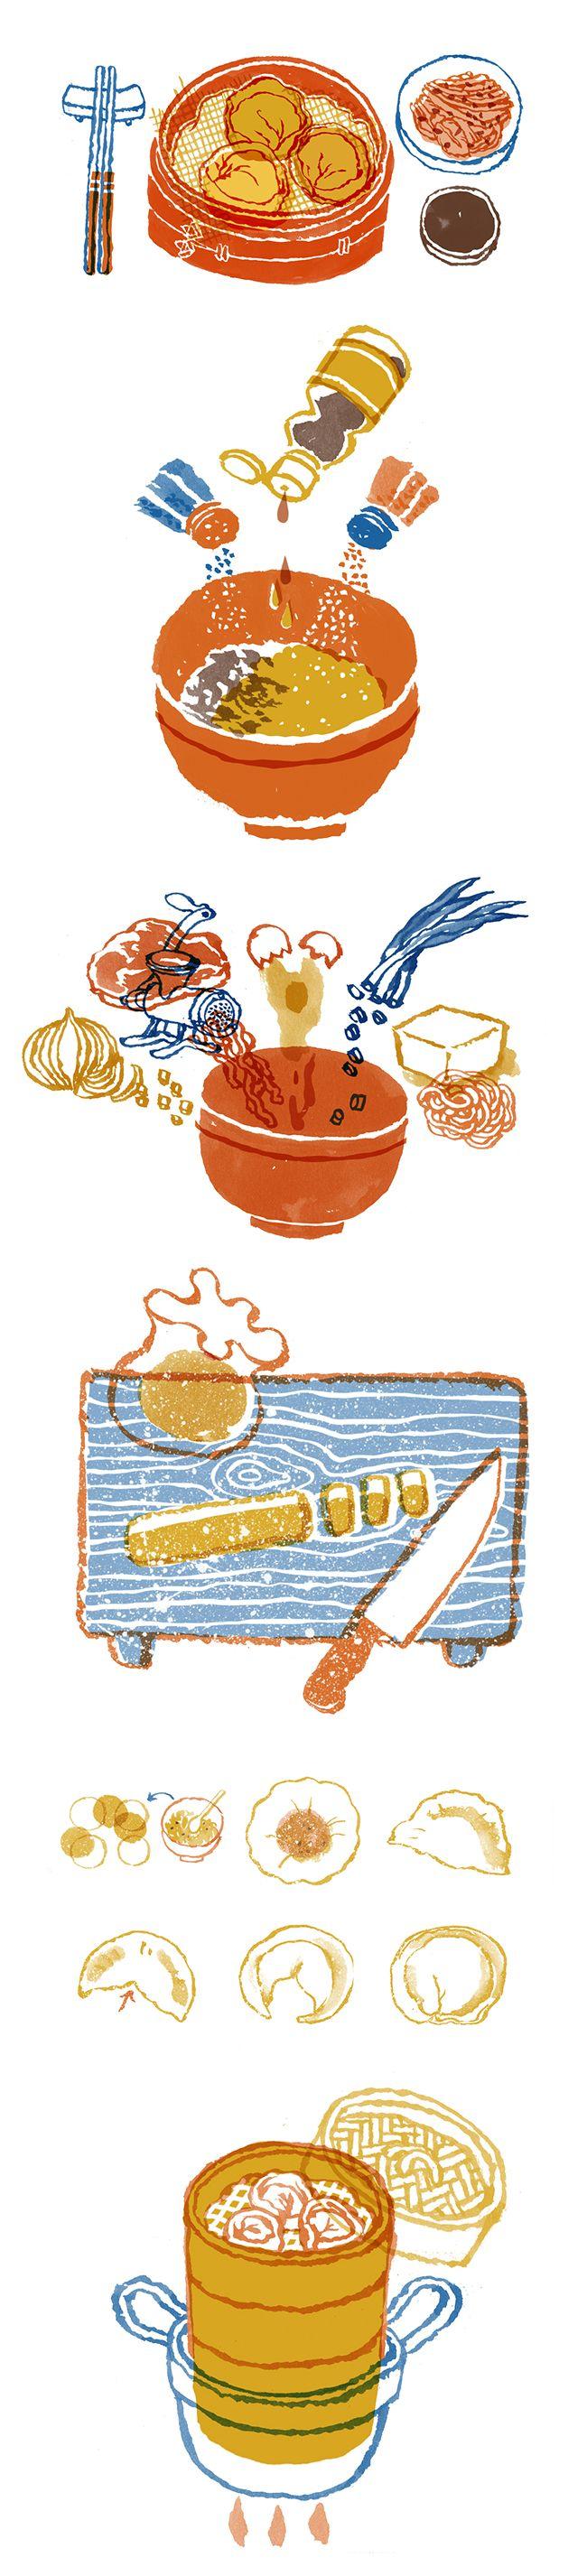 'How to make Korean dumplings' by Hayelin Choi